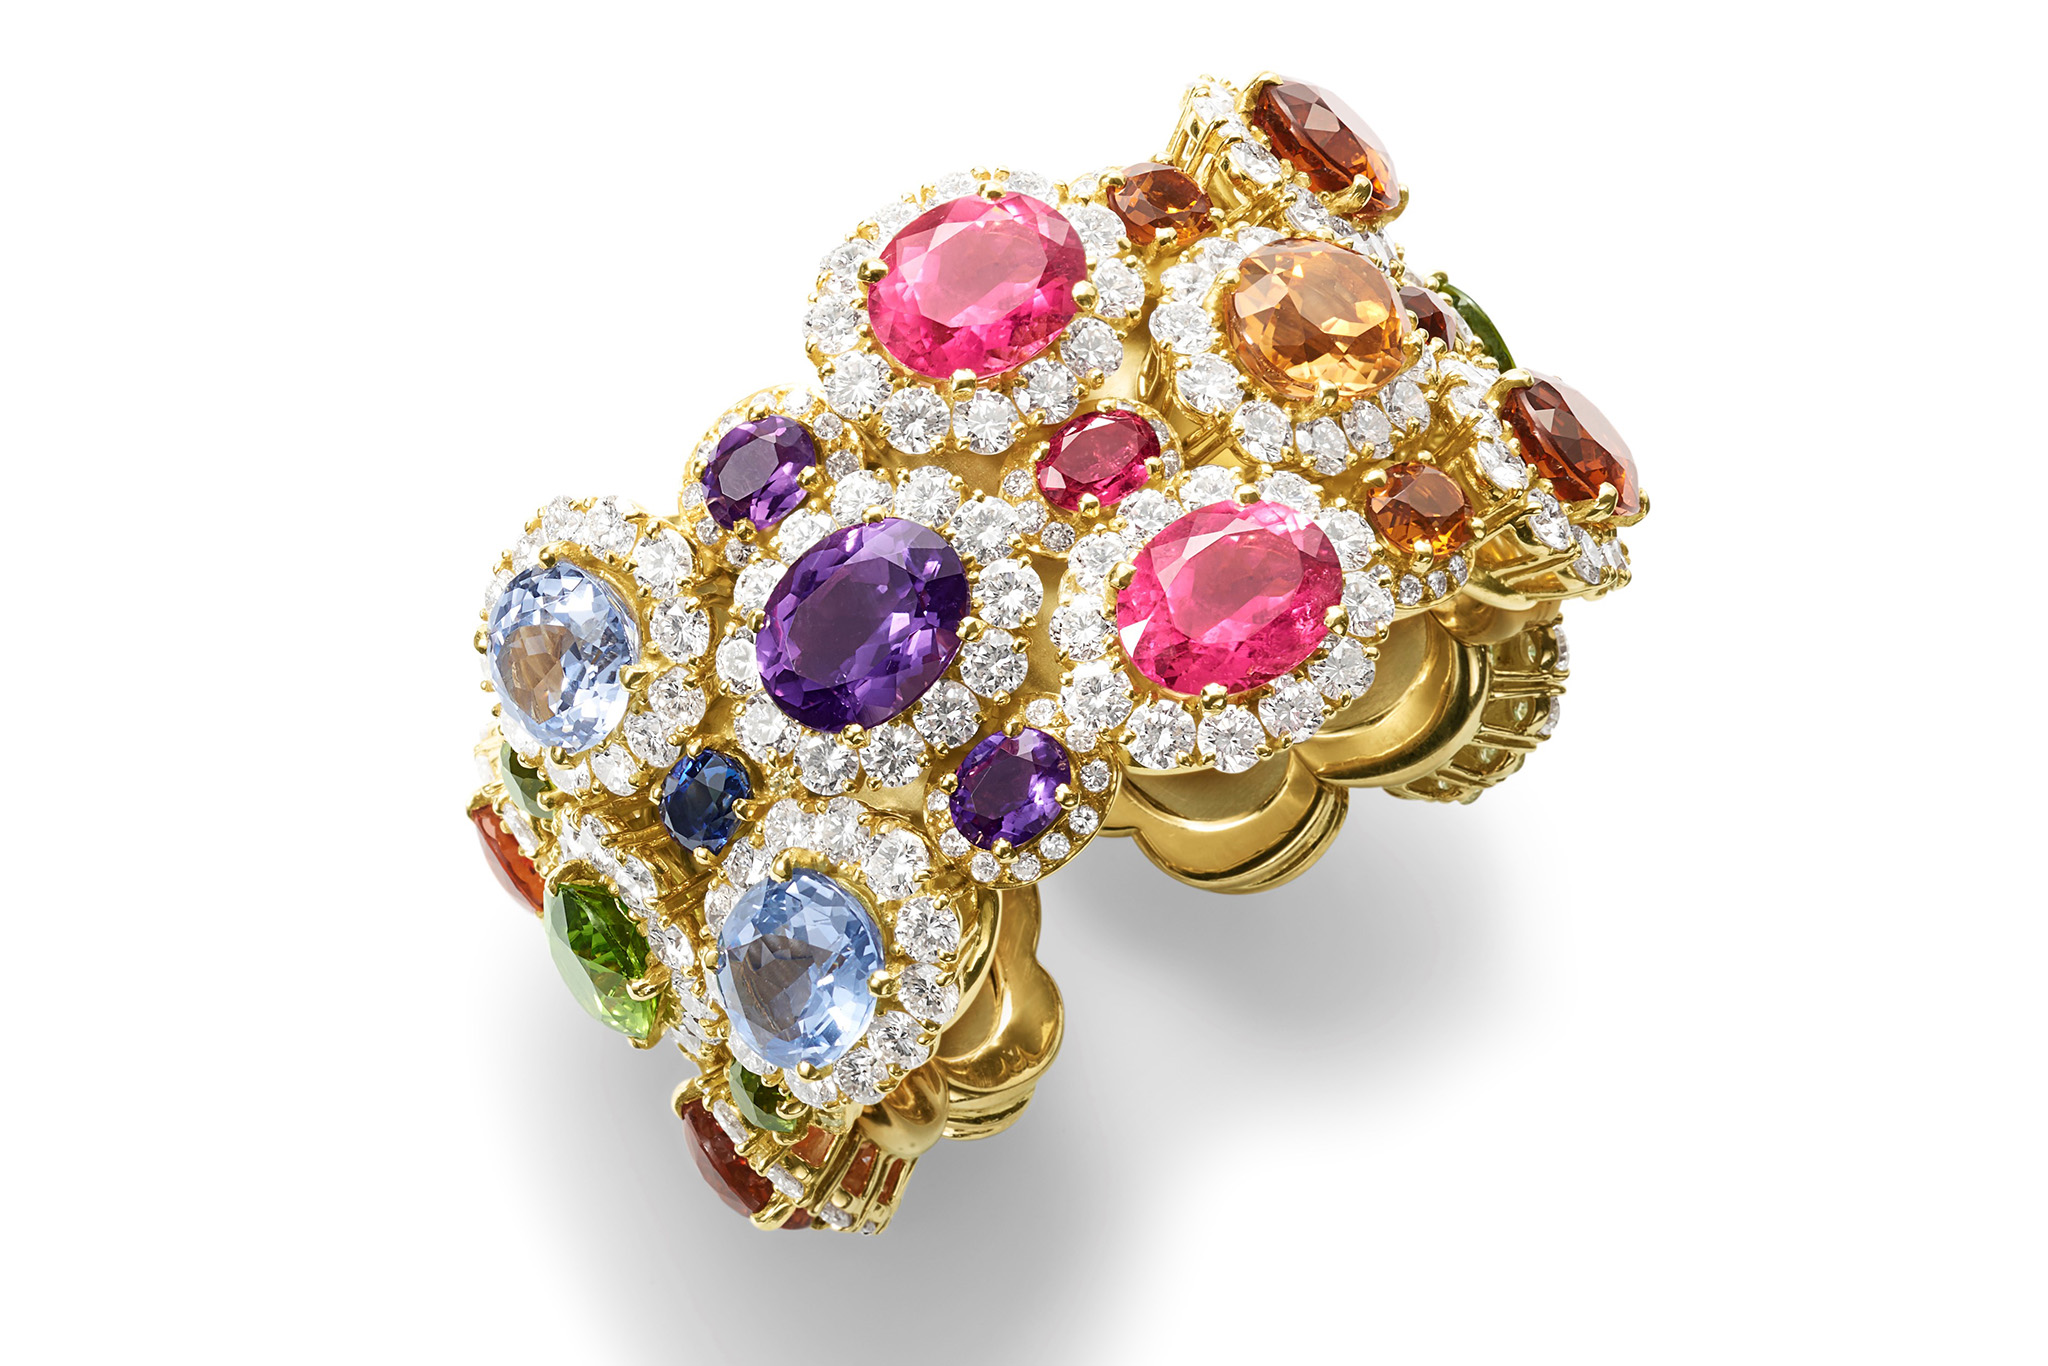 Jewelry from Marina B.